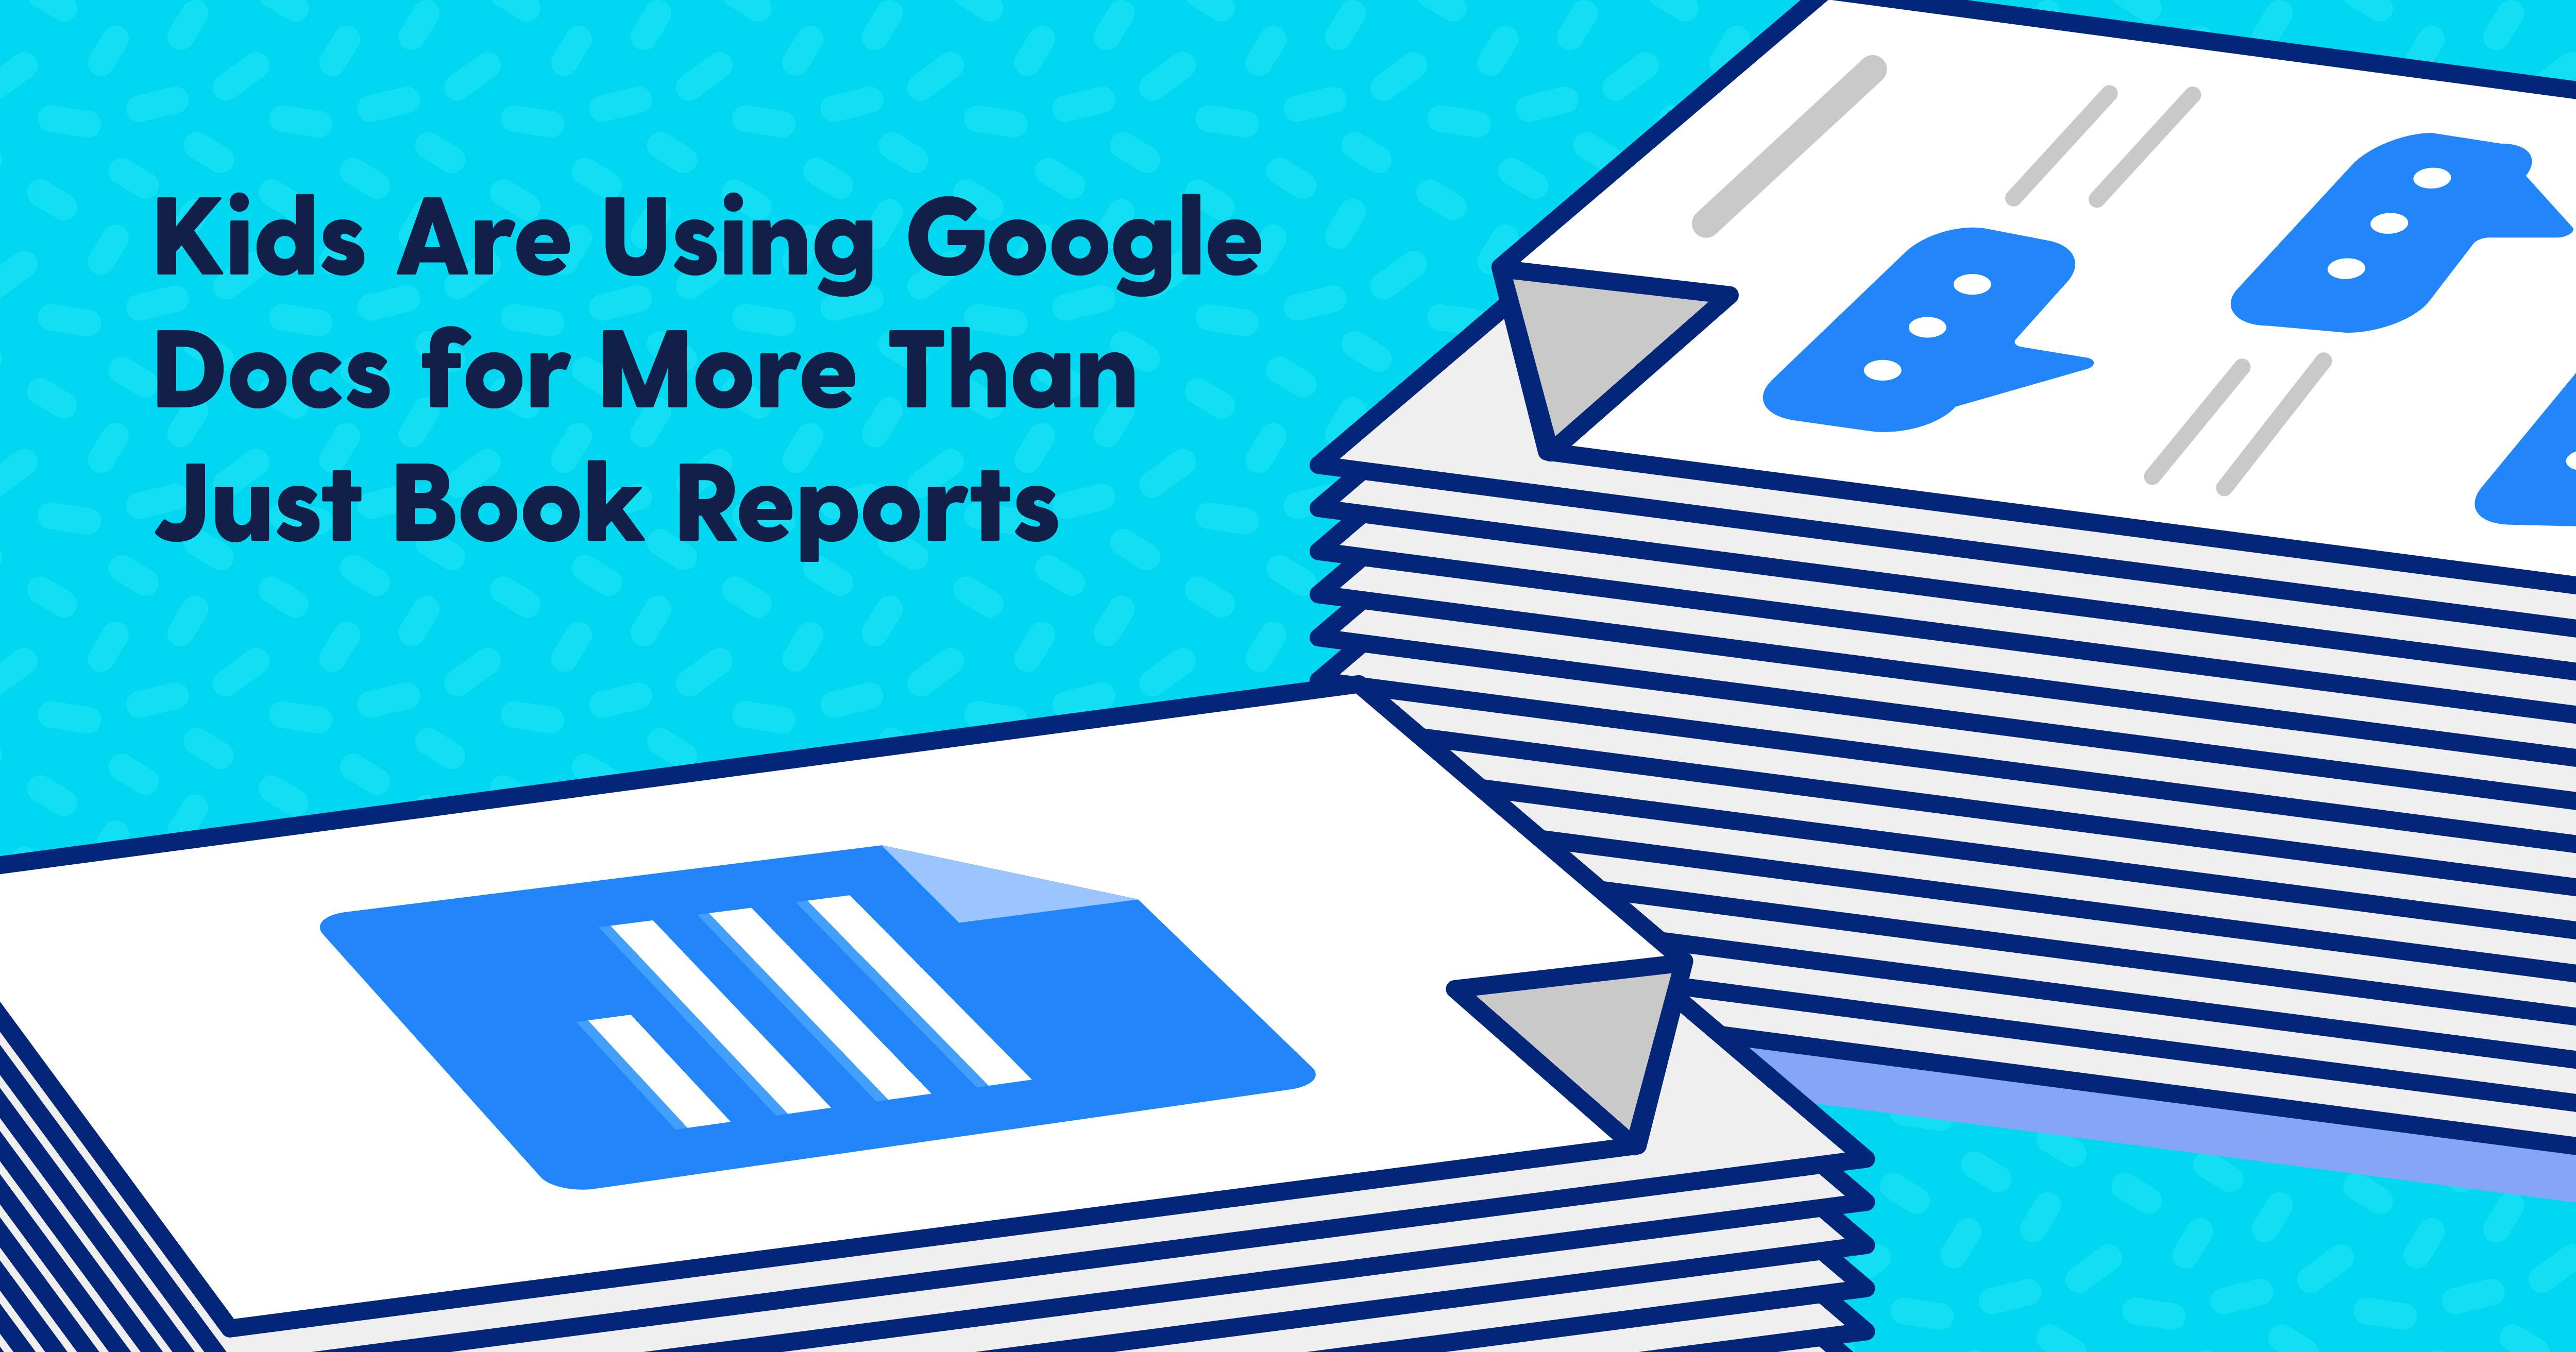 Google Docs for Kids: What Parents Should Know